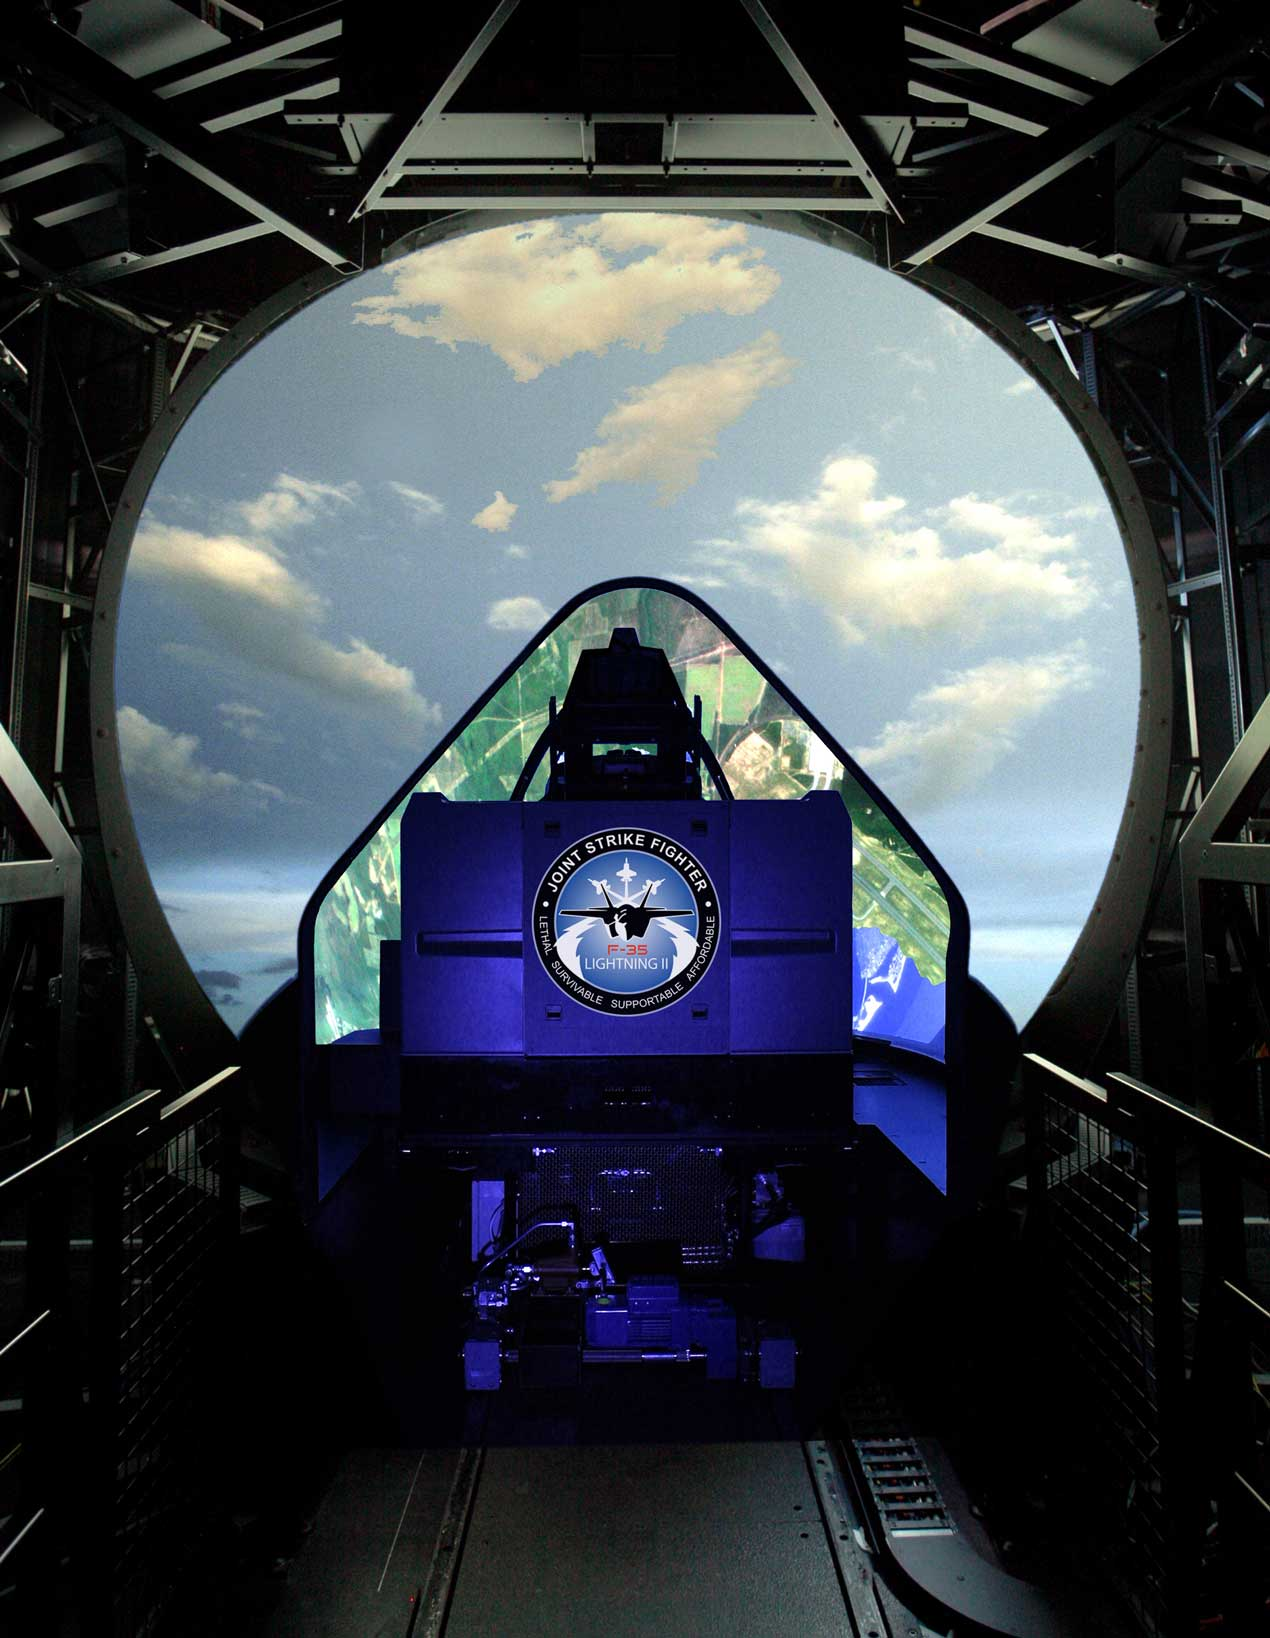 F 35 Full Mission Simulator